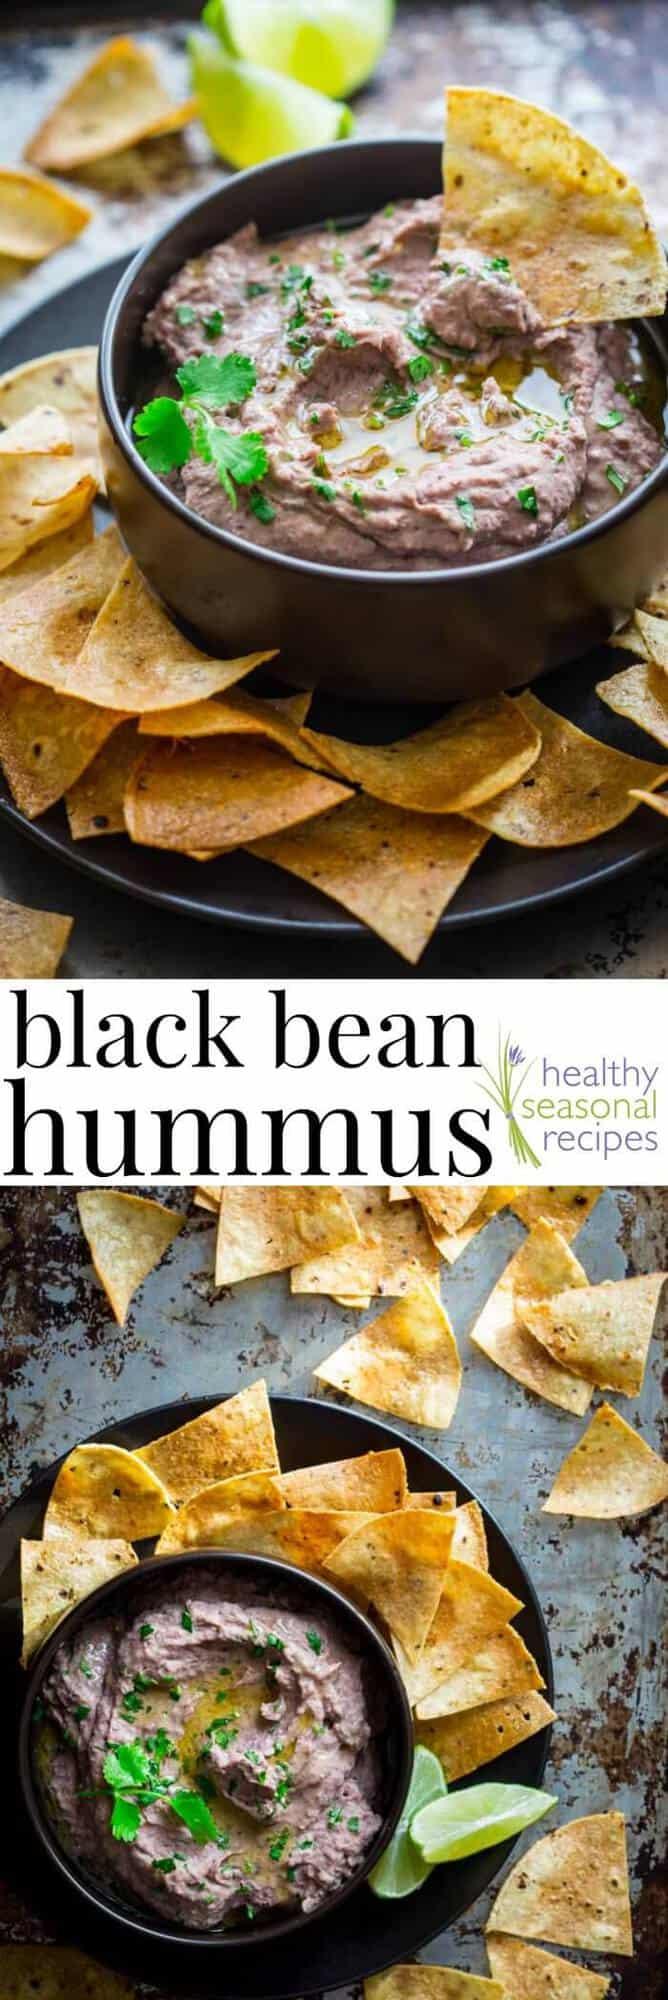 Black Bean Hummus, one of the BEST easy appetizers. Serve with veggies or tortilla chips. It is naturally gluten-free too! #plantbased #meatless #vegetarian #vegan #healthy #glutenfree #appetizer #superbowl #cleaneating #hummus #healthyseasonal